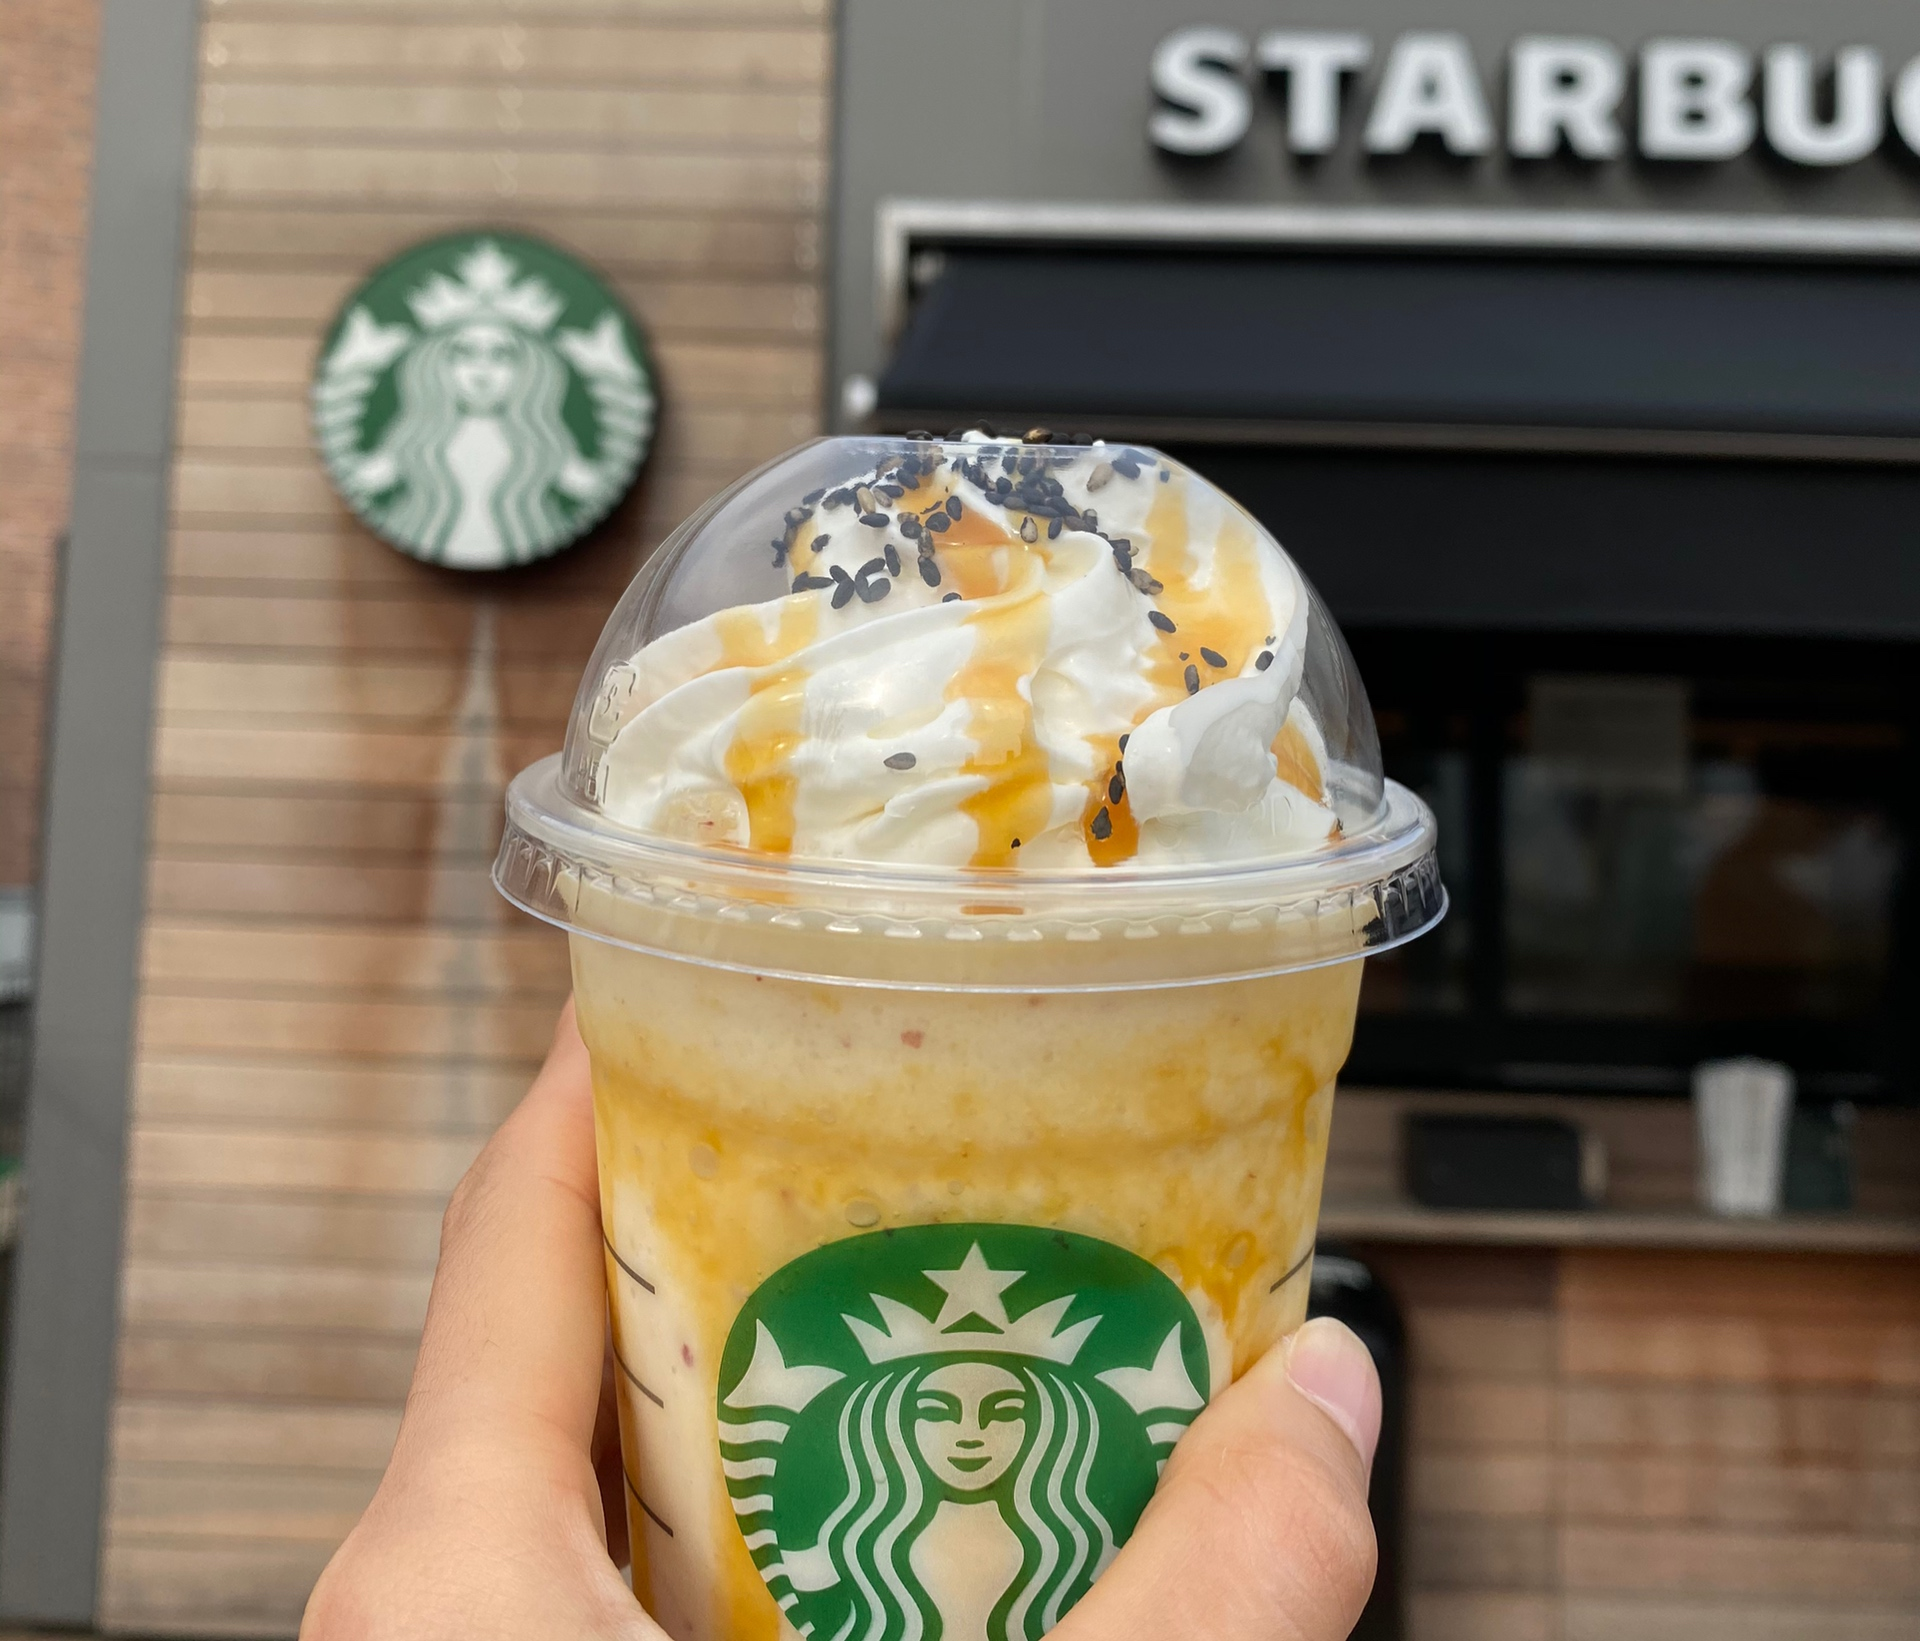 【STARBACKS】秋の新作!大学芋フラペチーノ飲んでみたレポ♡_1